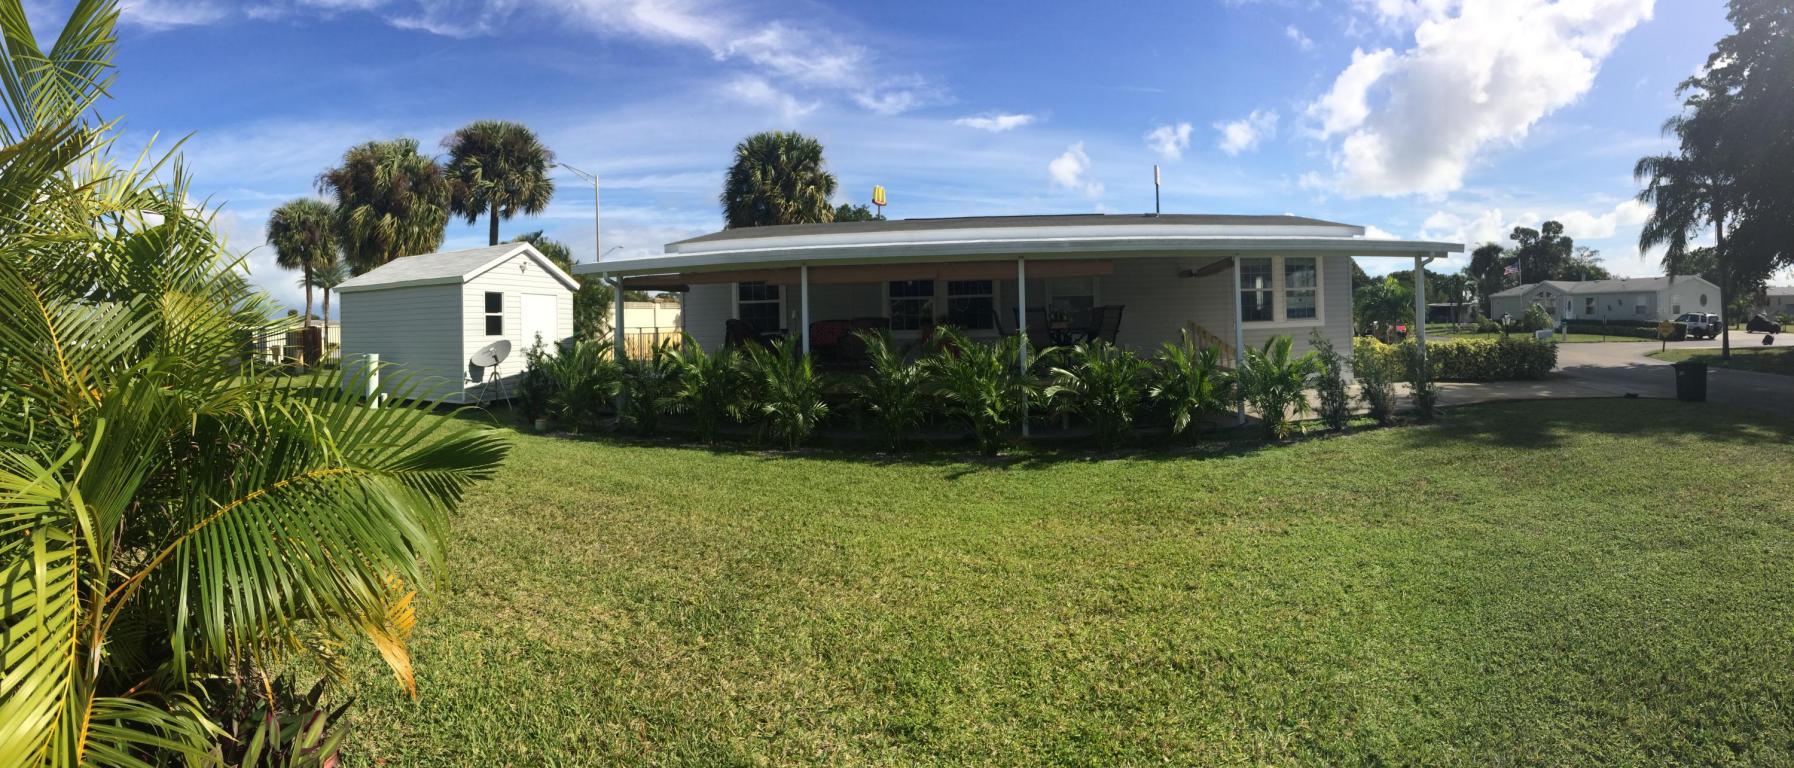 4267 72nd Street #1003, West Palm Beach, FL 33404